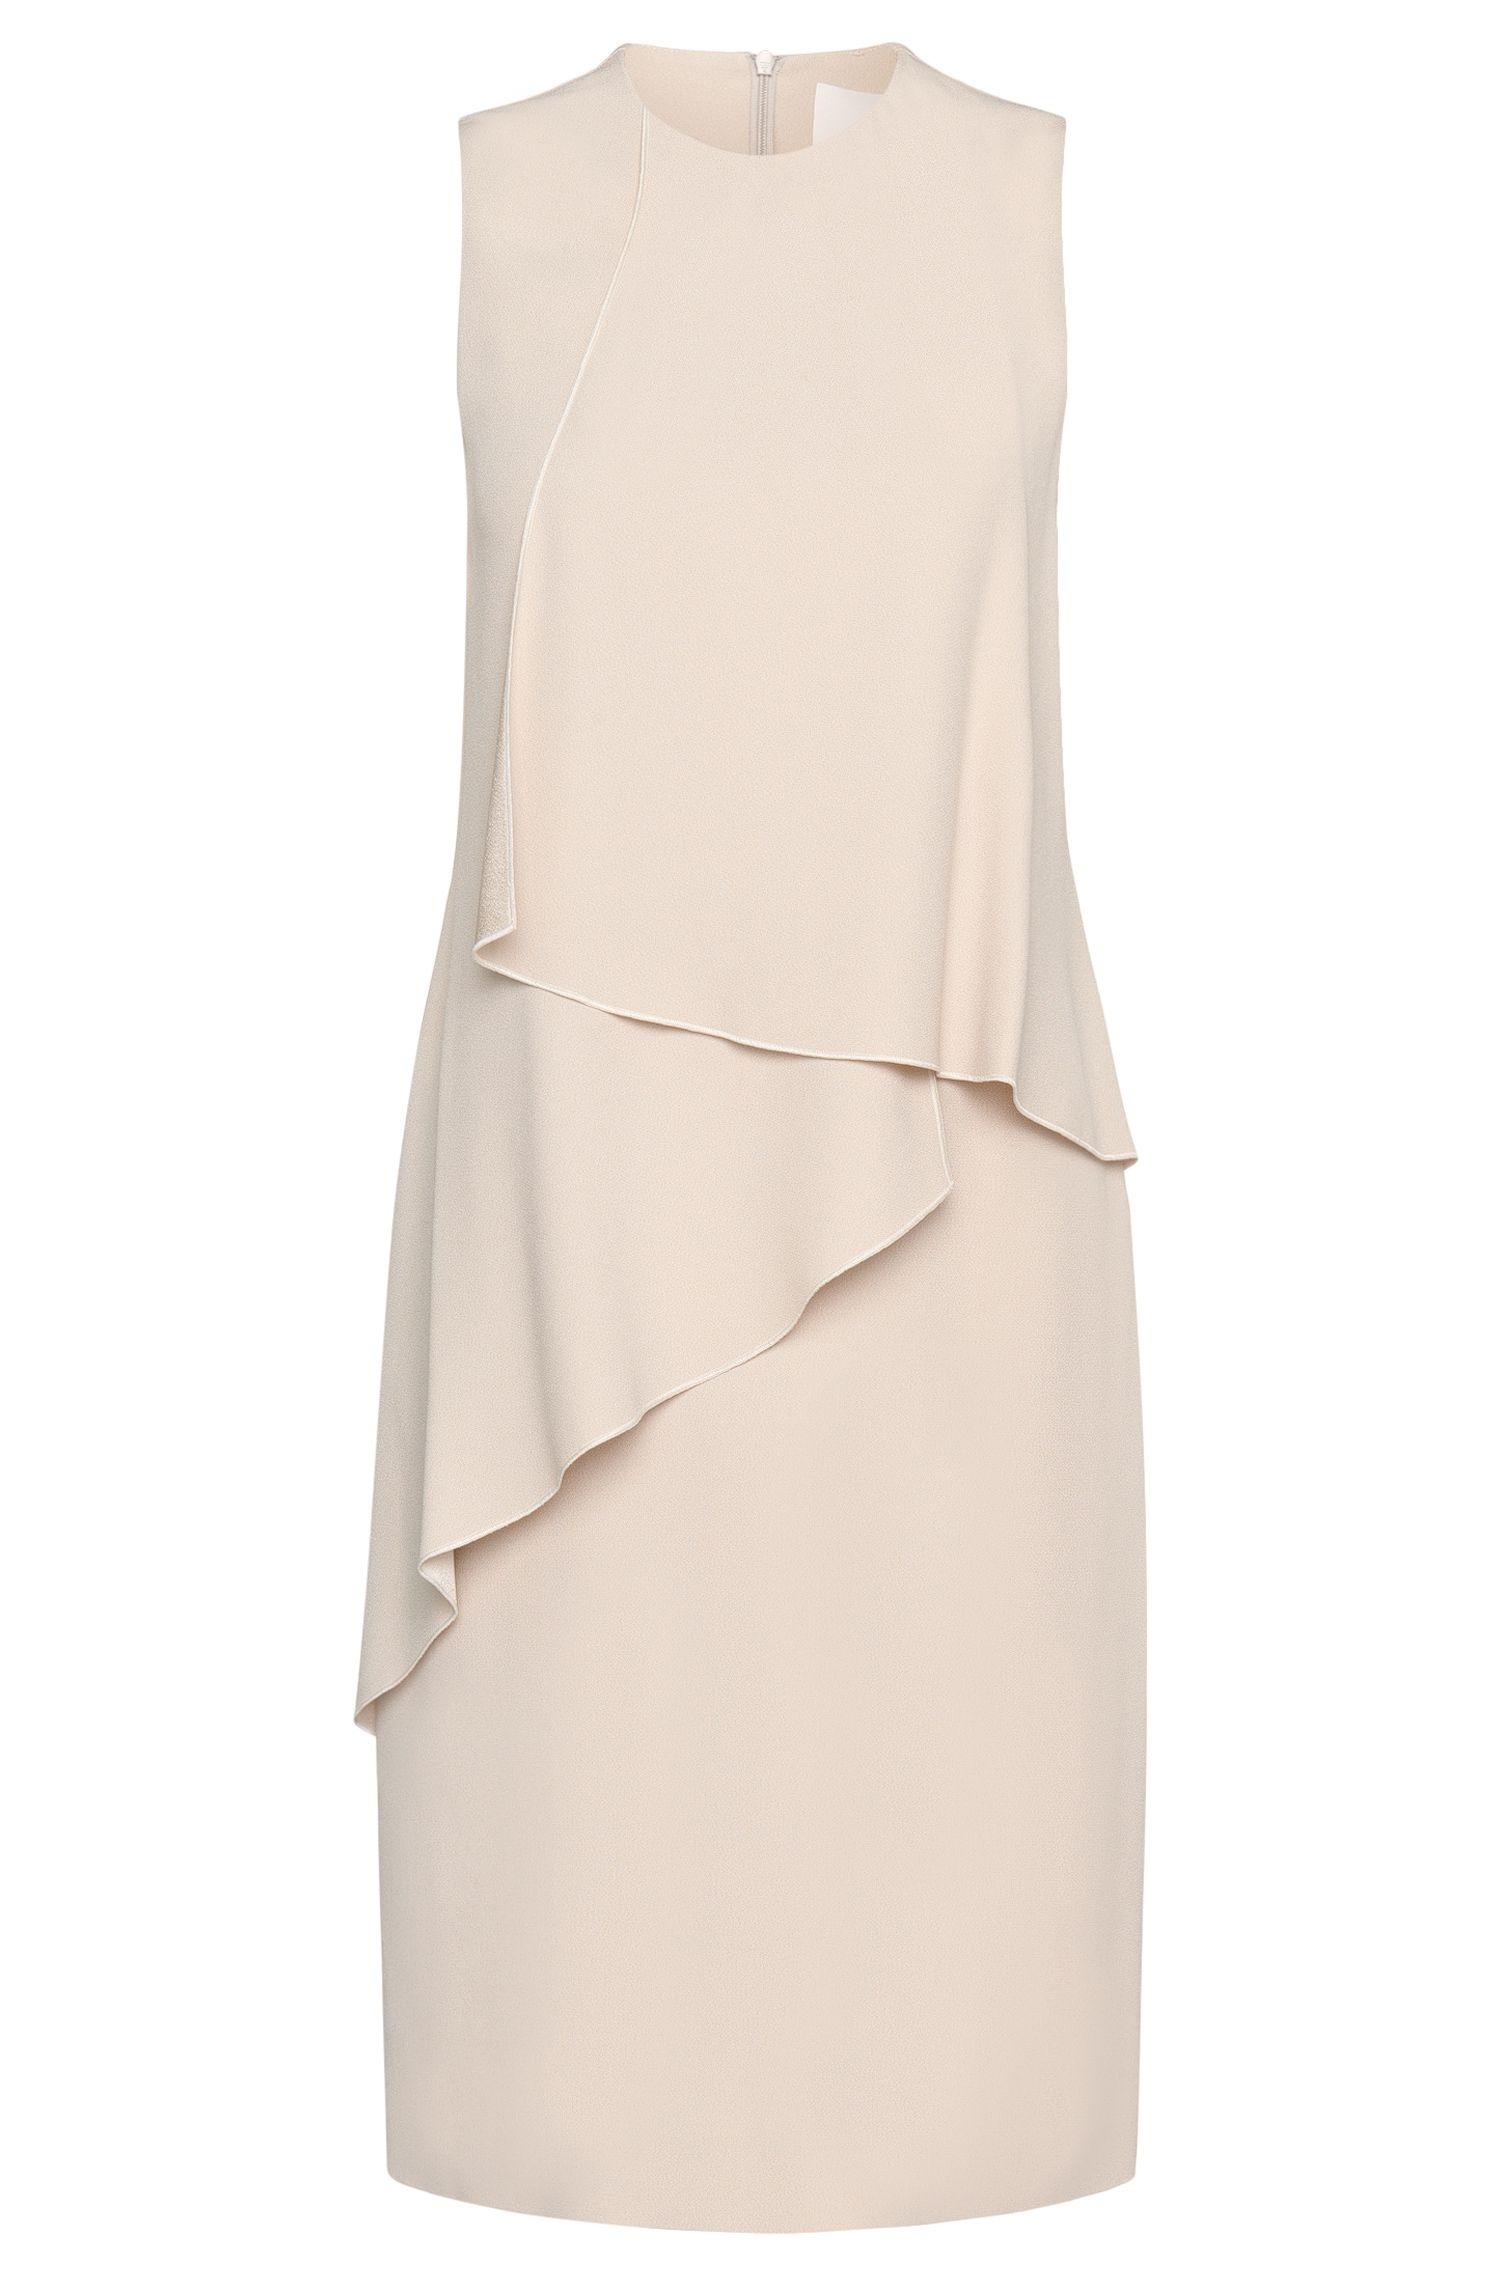 Crepe Sating Layered Flounce Dress | Dalynea